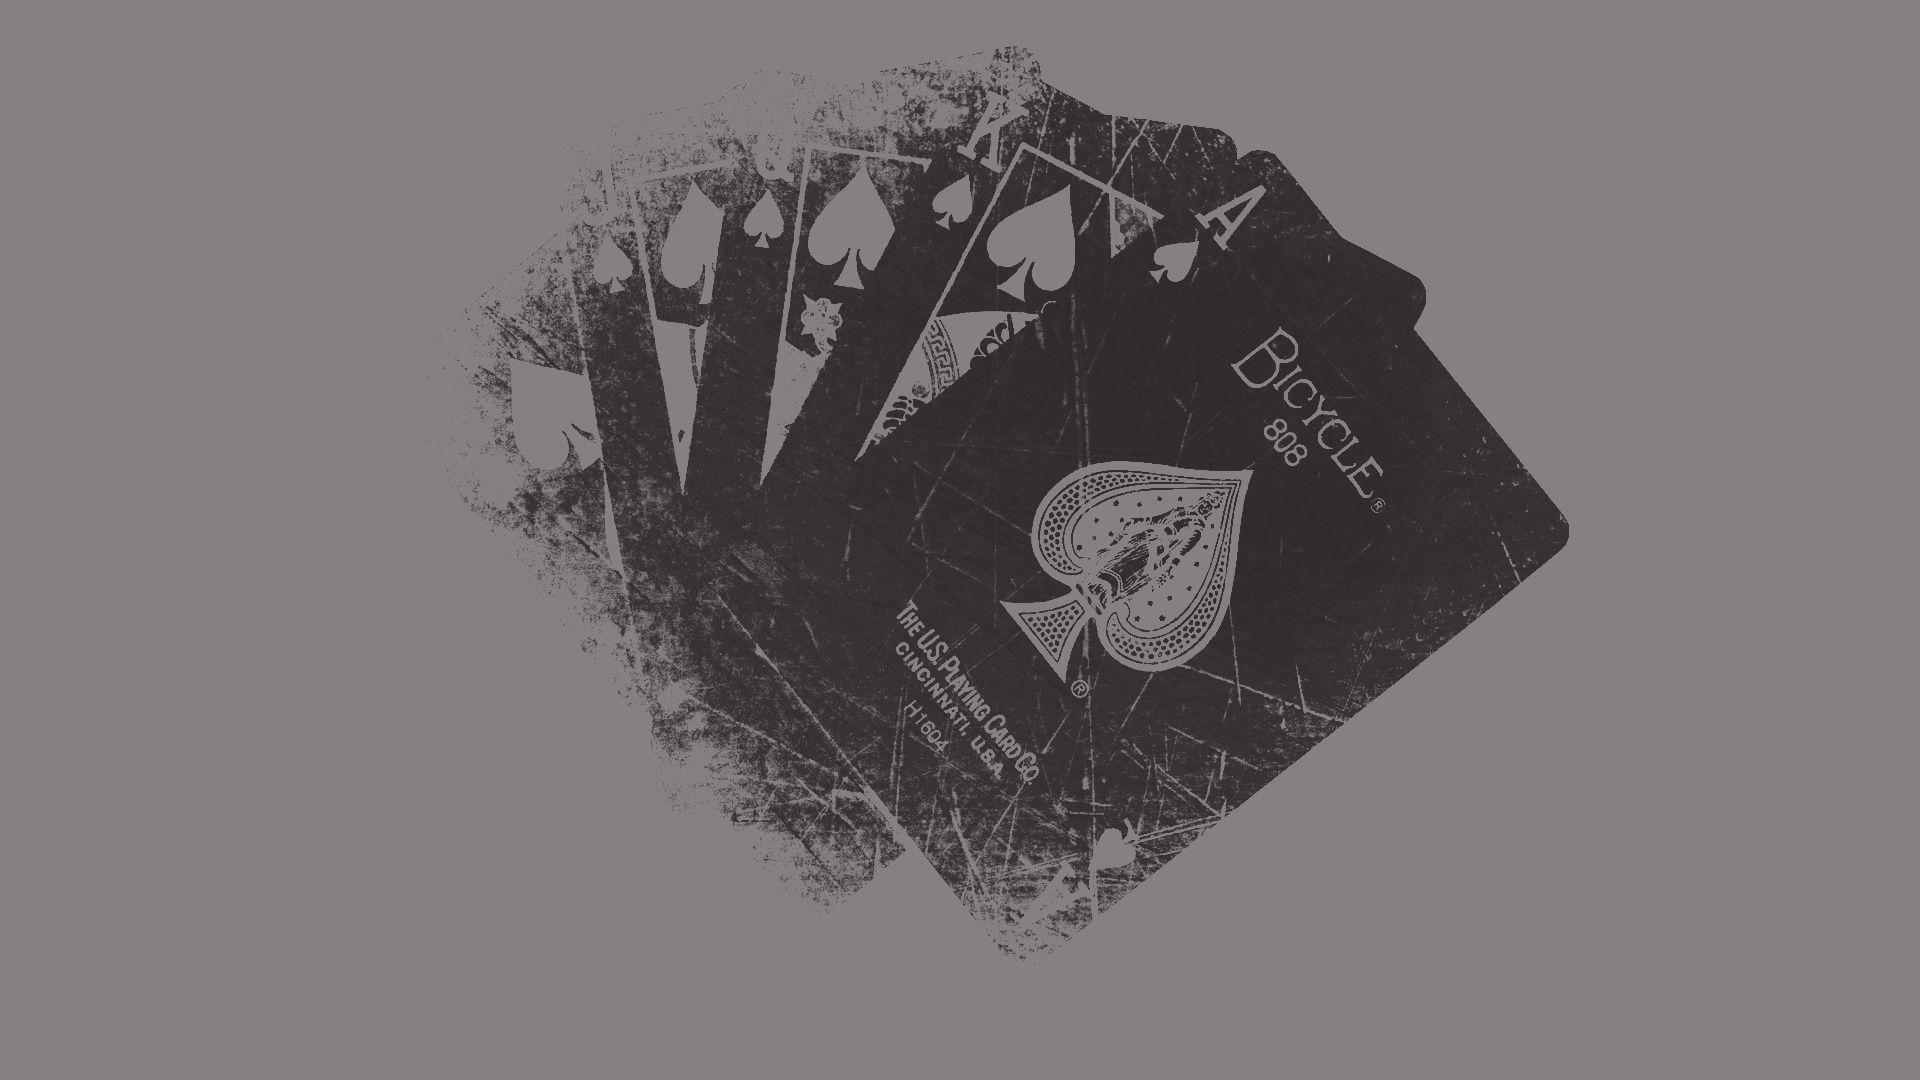 black grunge playing cards hd wallpaper background free